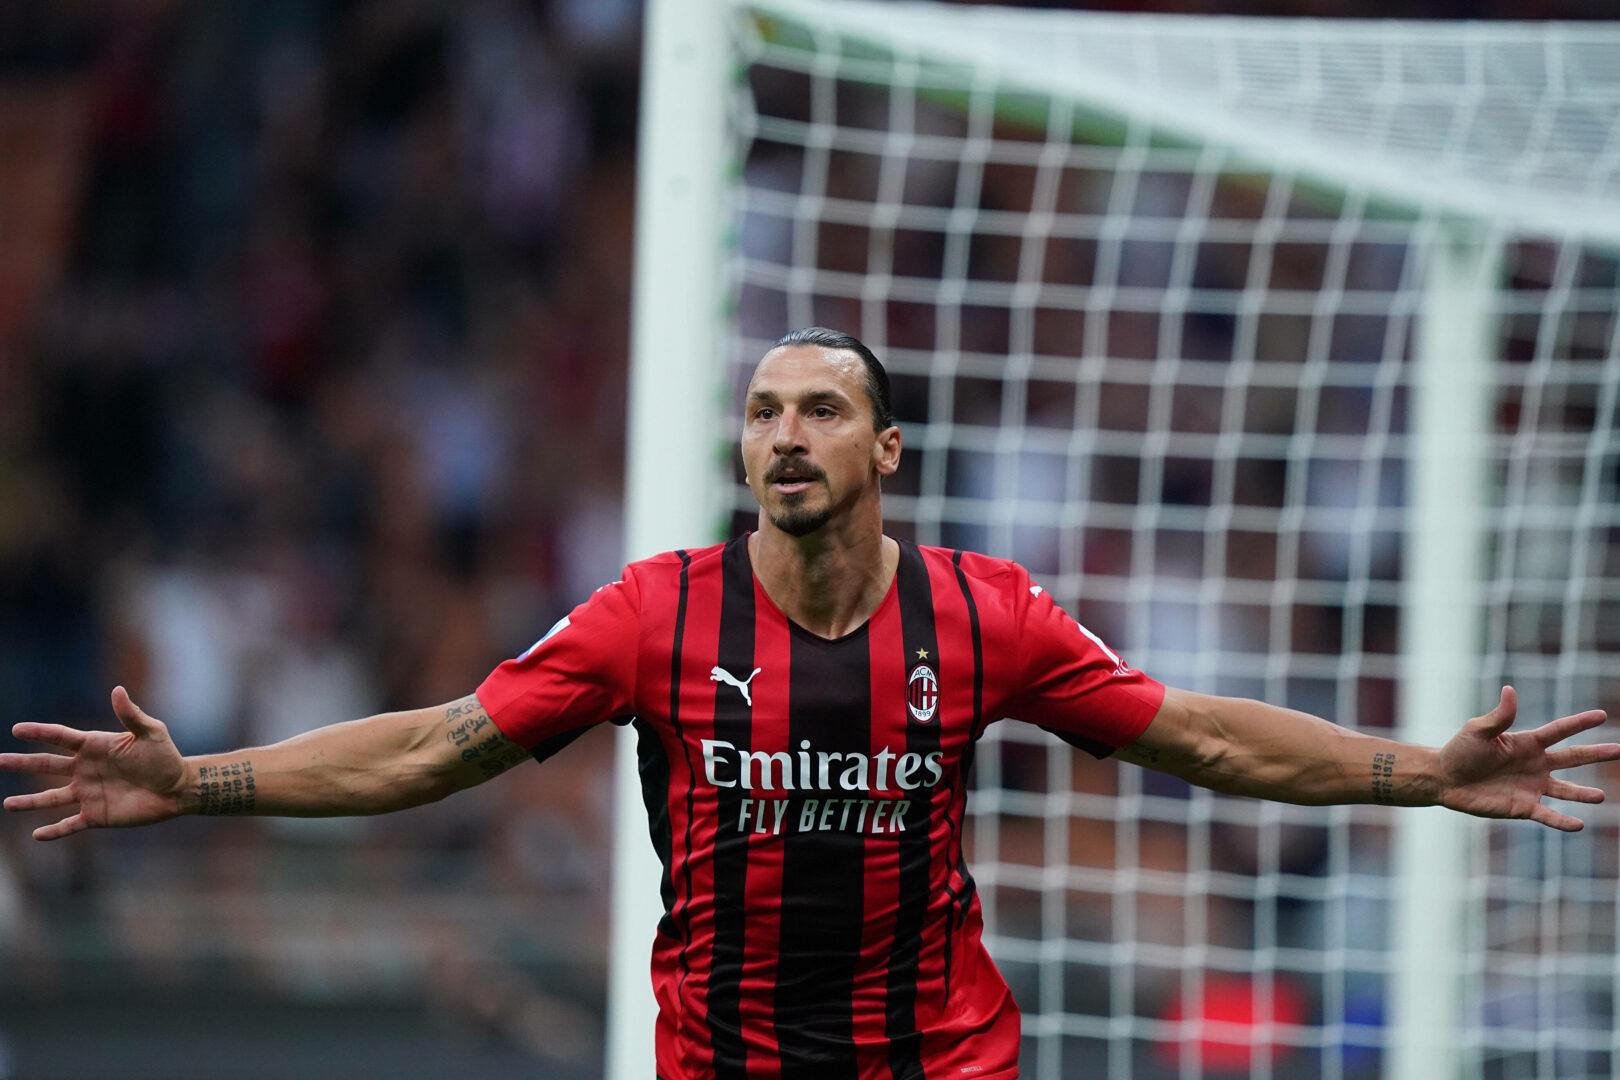 Milan souverän gegen schwaches Lazio – Ibrahimovic trifft bei Comeback!